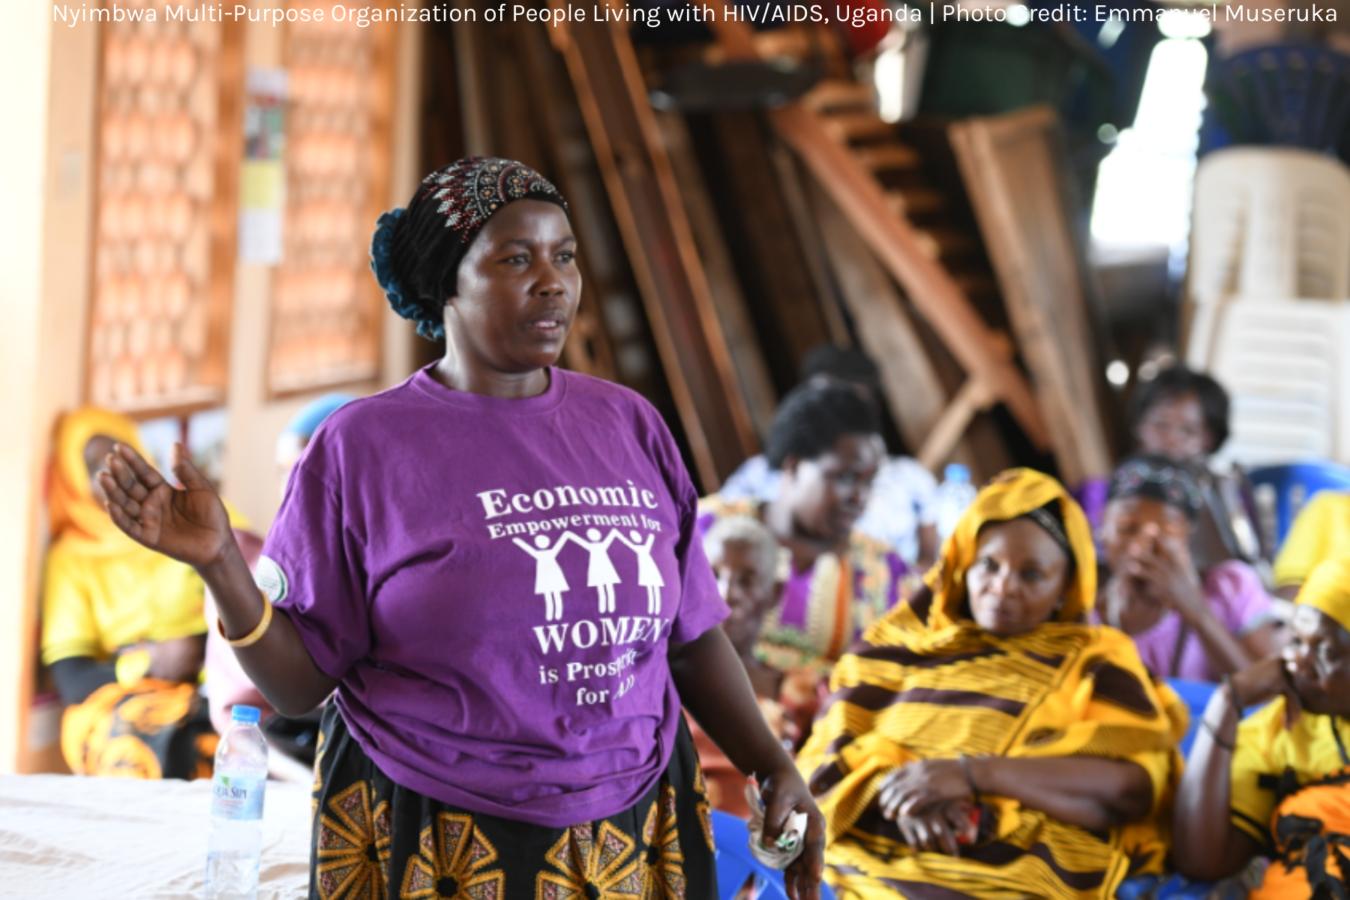 Nyimbwa Multi-purpose Organisation of people living with HIV/AIDS